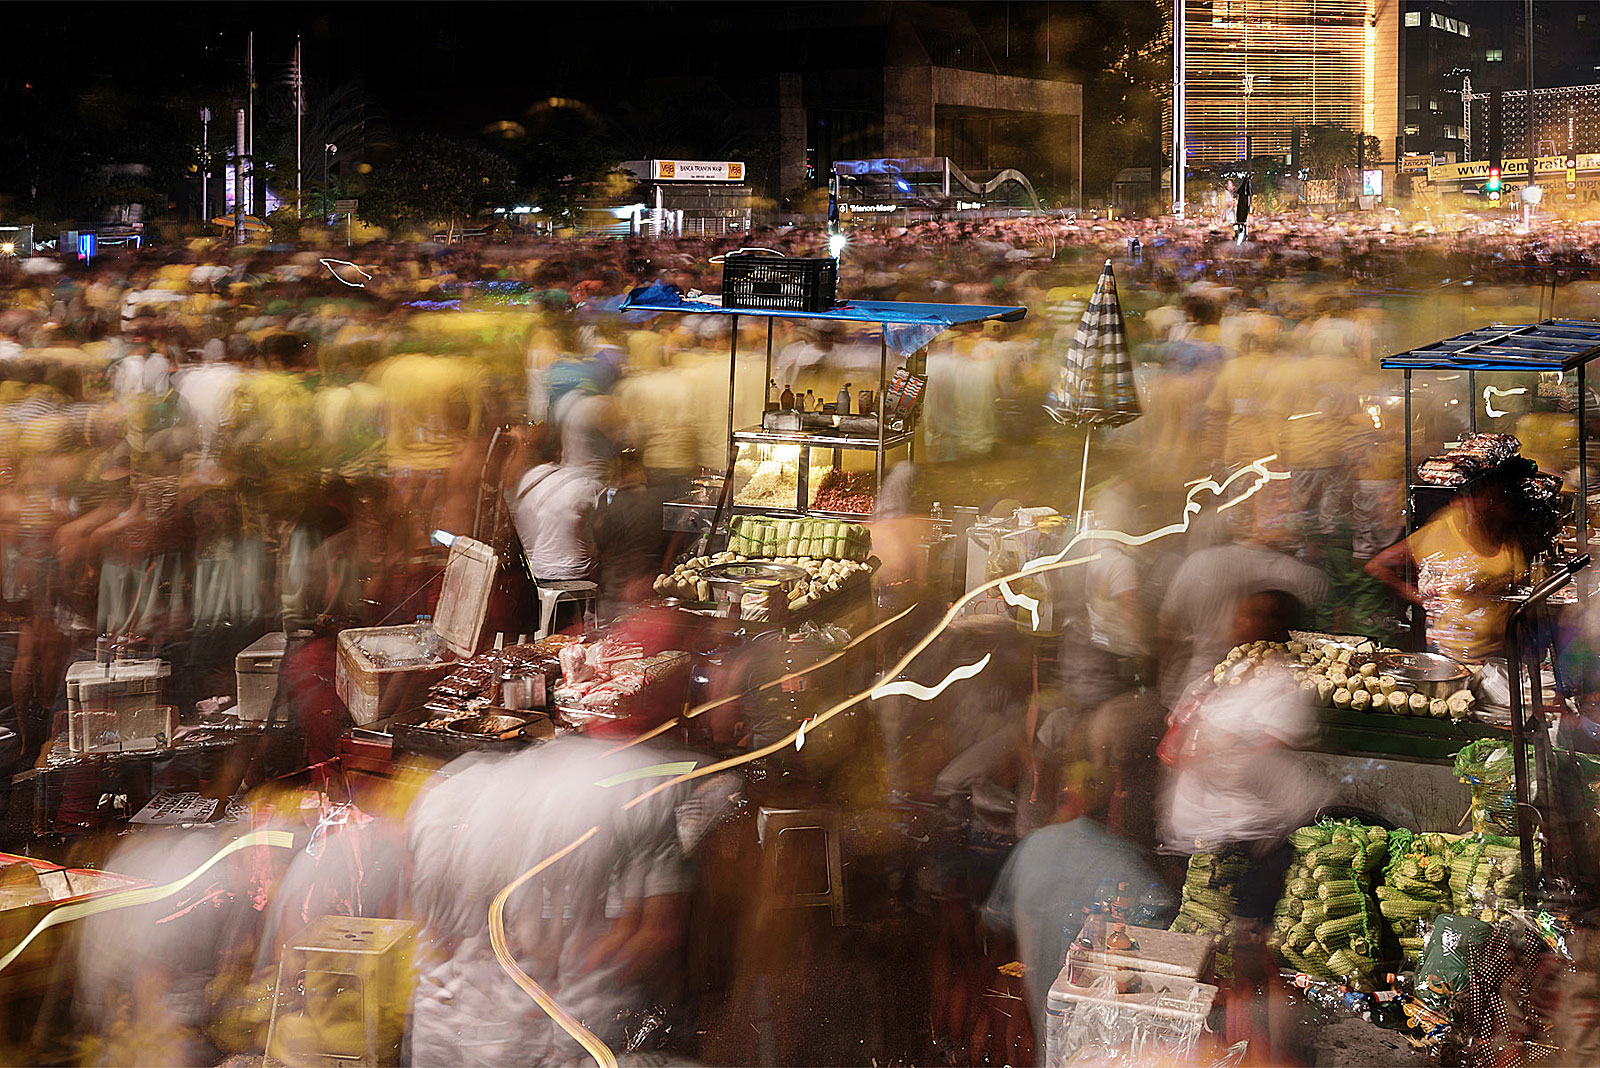 Manifestação, Avenida Paulista (20.17 - 20.34 Uhr, 17.4.2016)